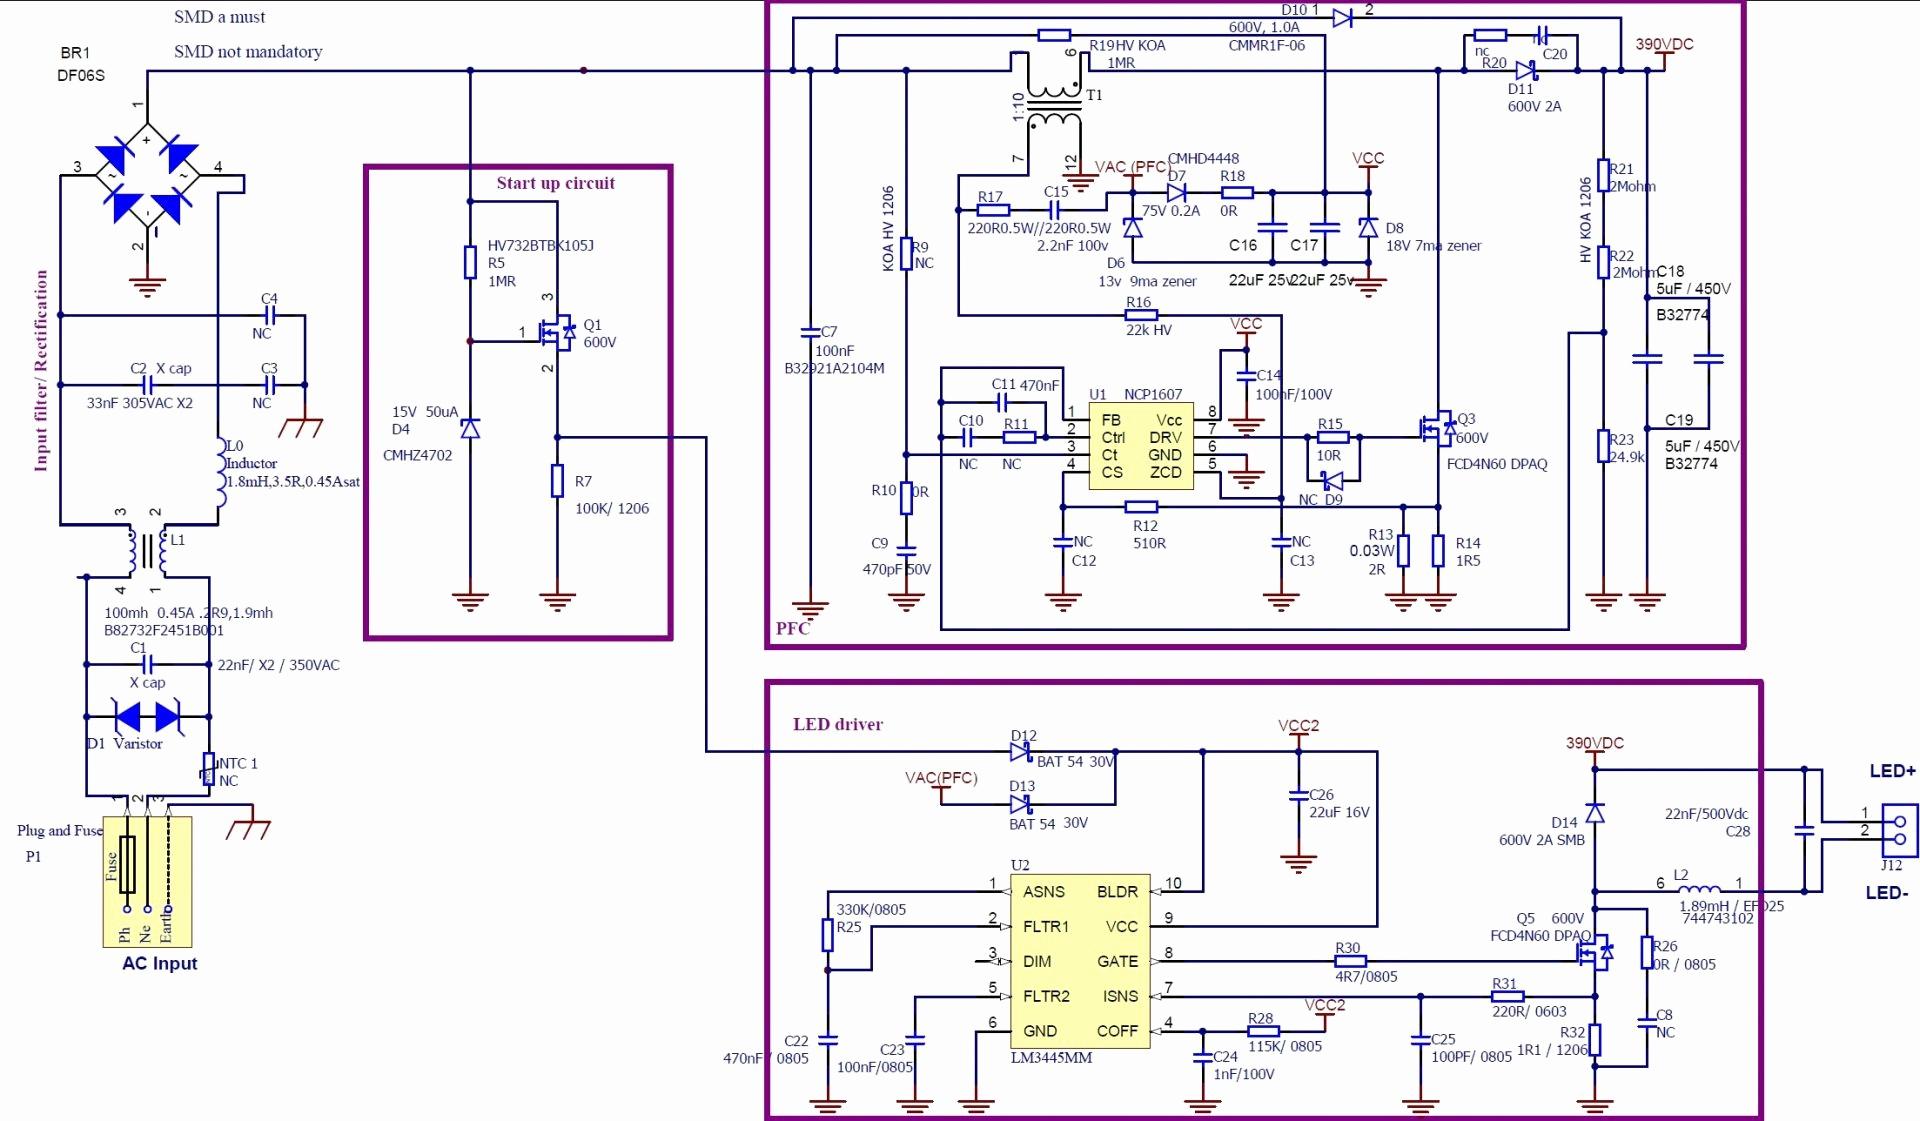 Lithonia T8 4 Bulb Wiring Diagram   Manual E-Books - 2 Lamp T8 Ballast Wiring Diagram